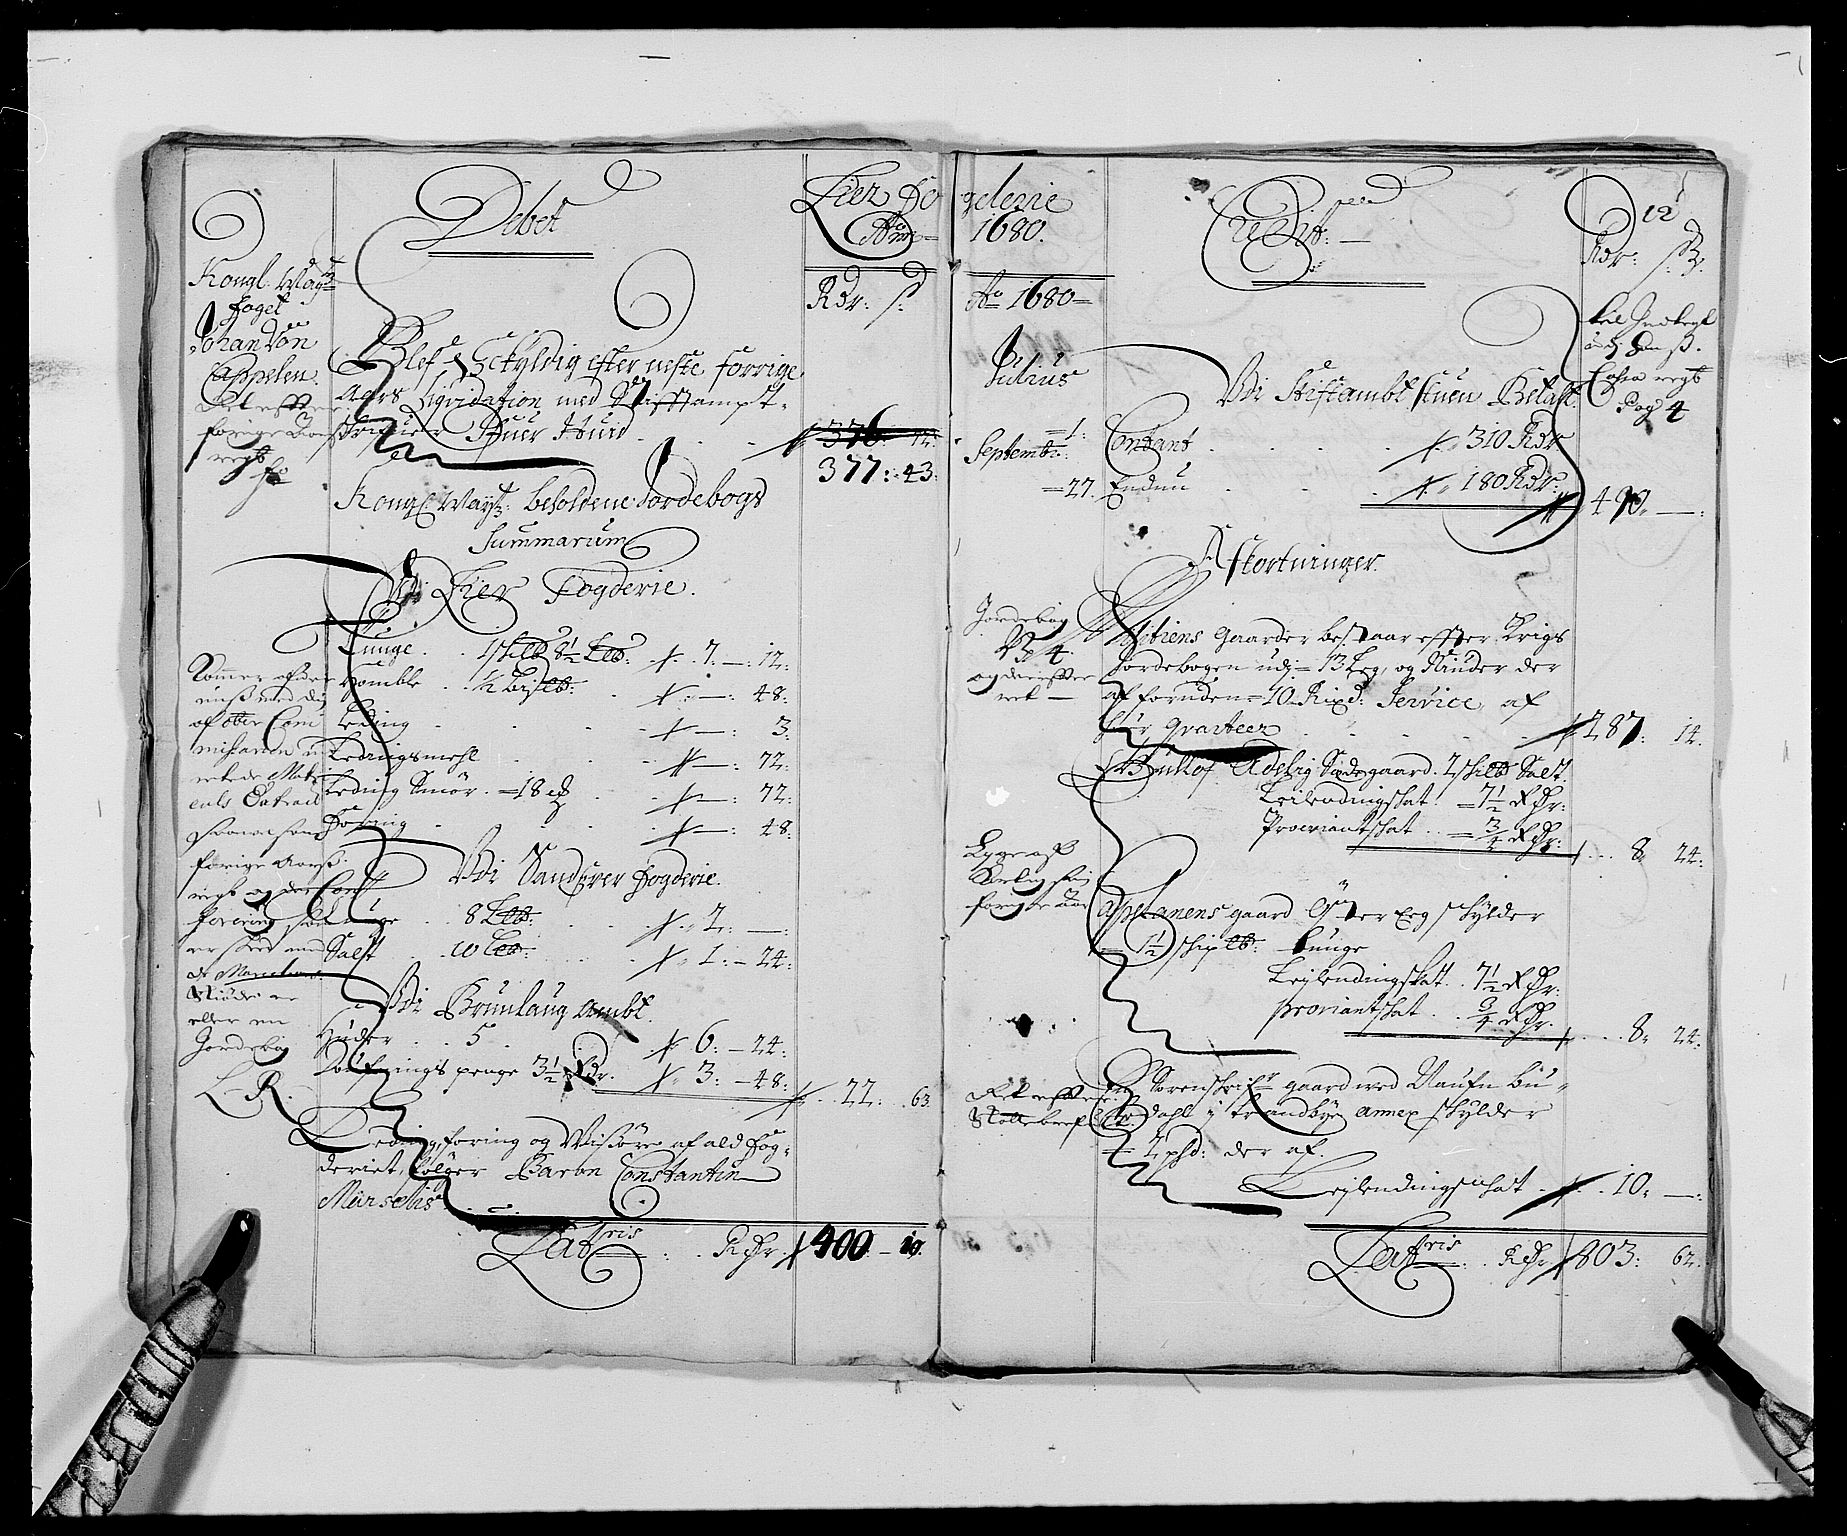 RA, Rentekammeret inntil 1814, Reviderte regnskaper, Fogderegnskap, R27/L1686: Fogderegnskap Lier, 1678-1686, s. 15